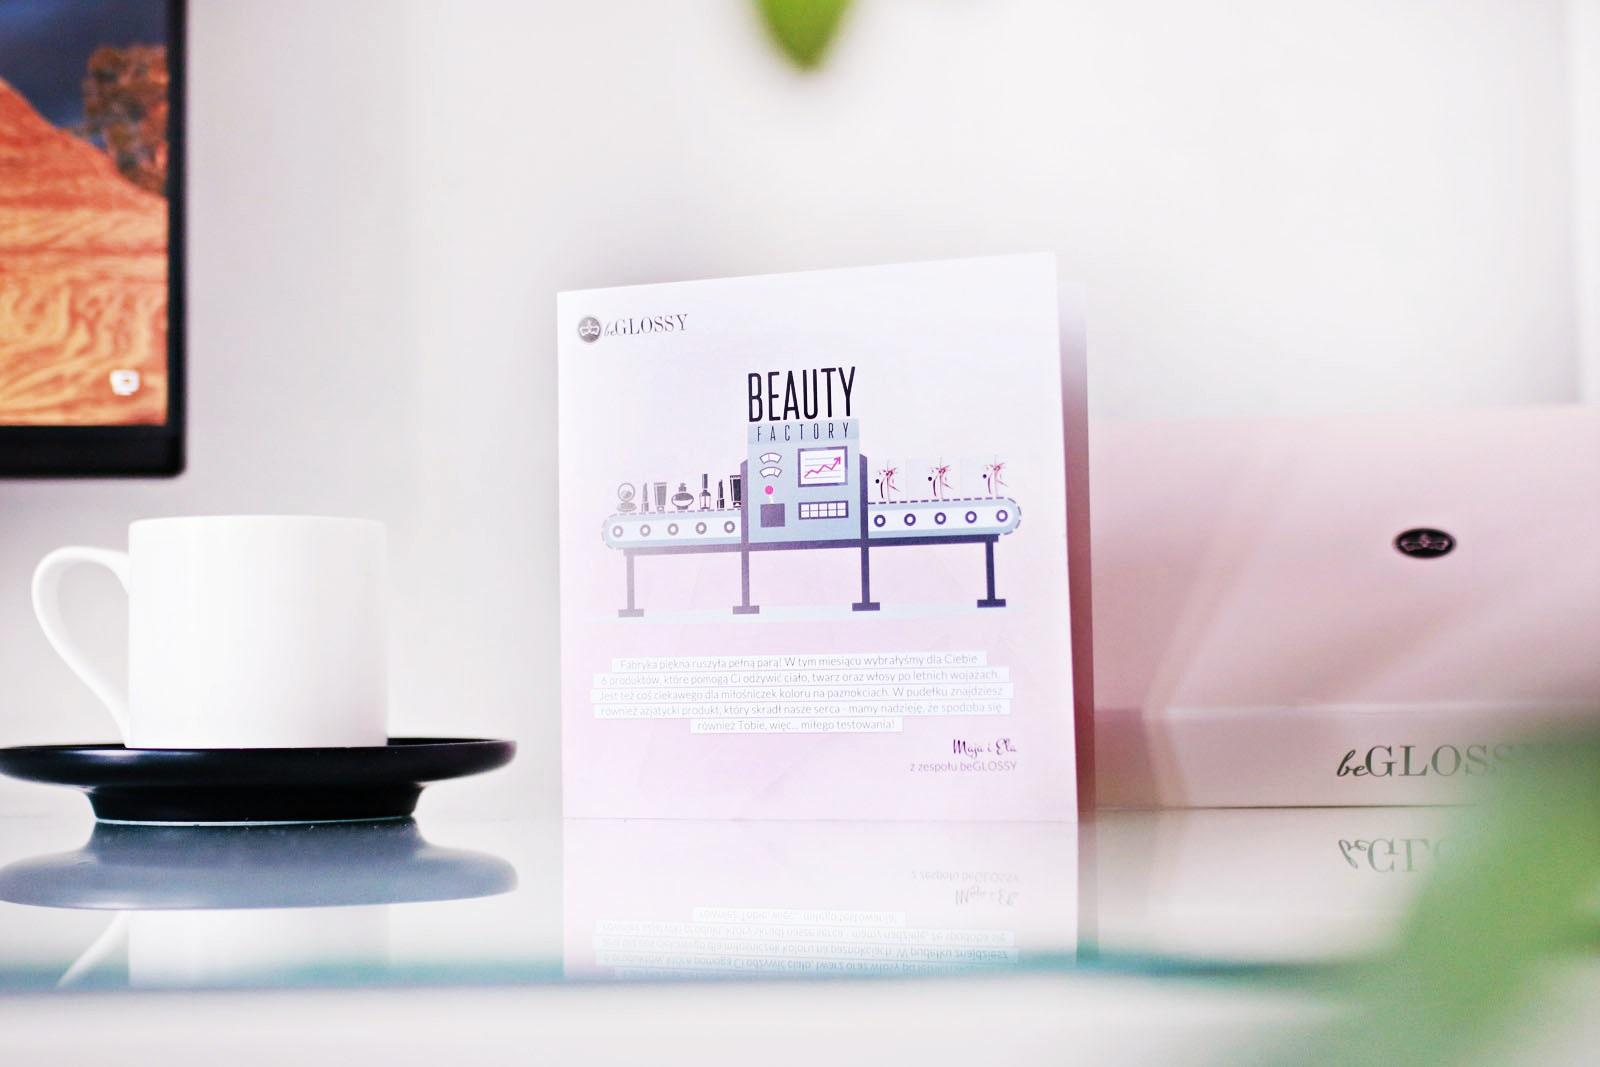 beGLOSSY Beauty Factory {przegląd pudełka wrzesień 2017}